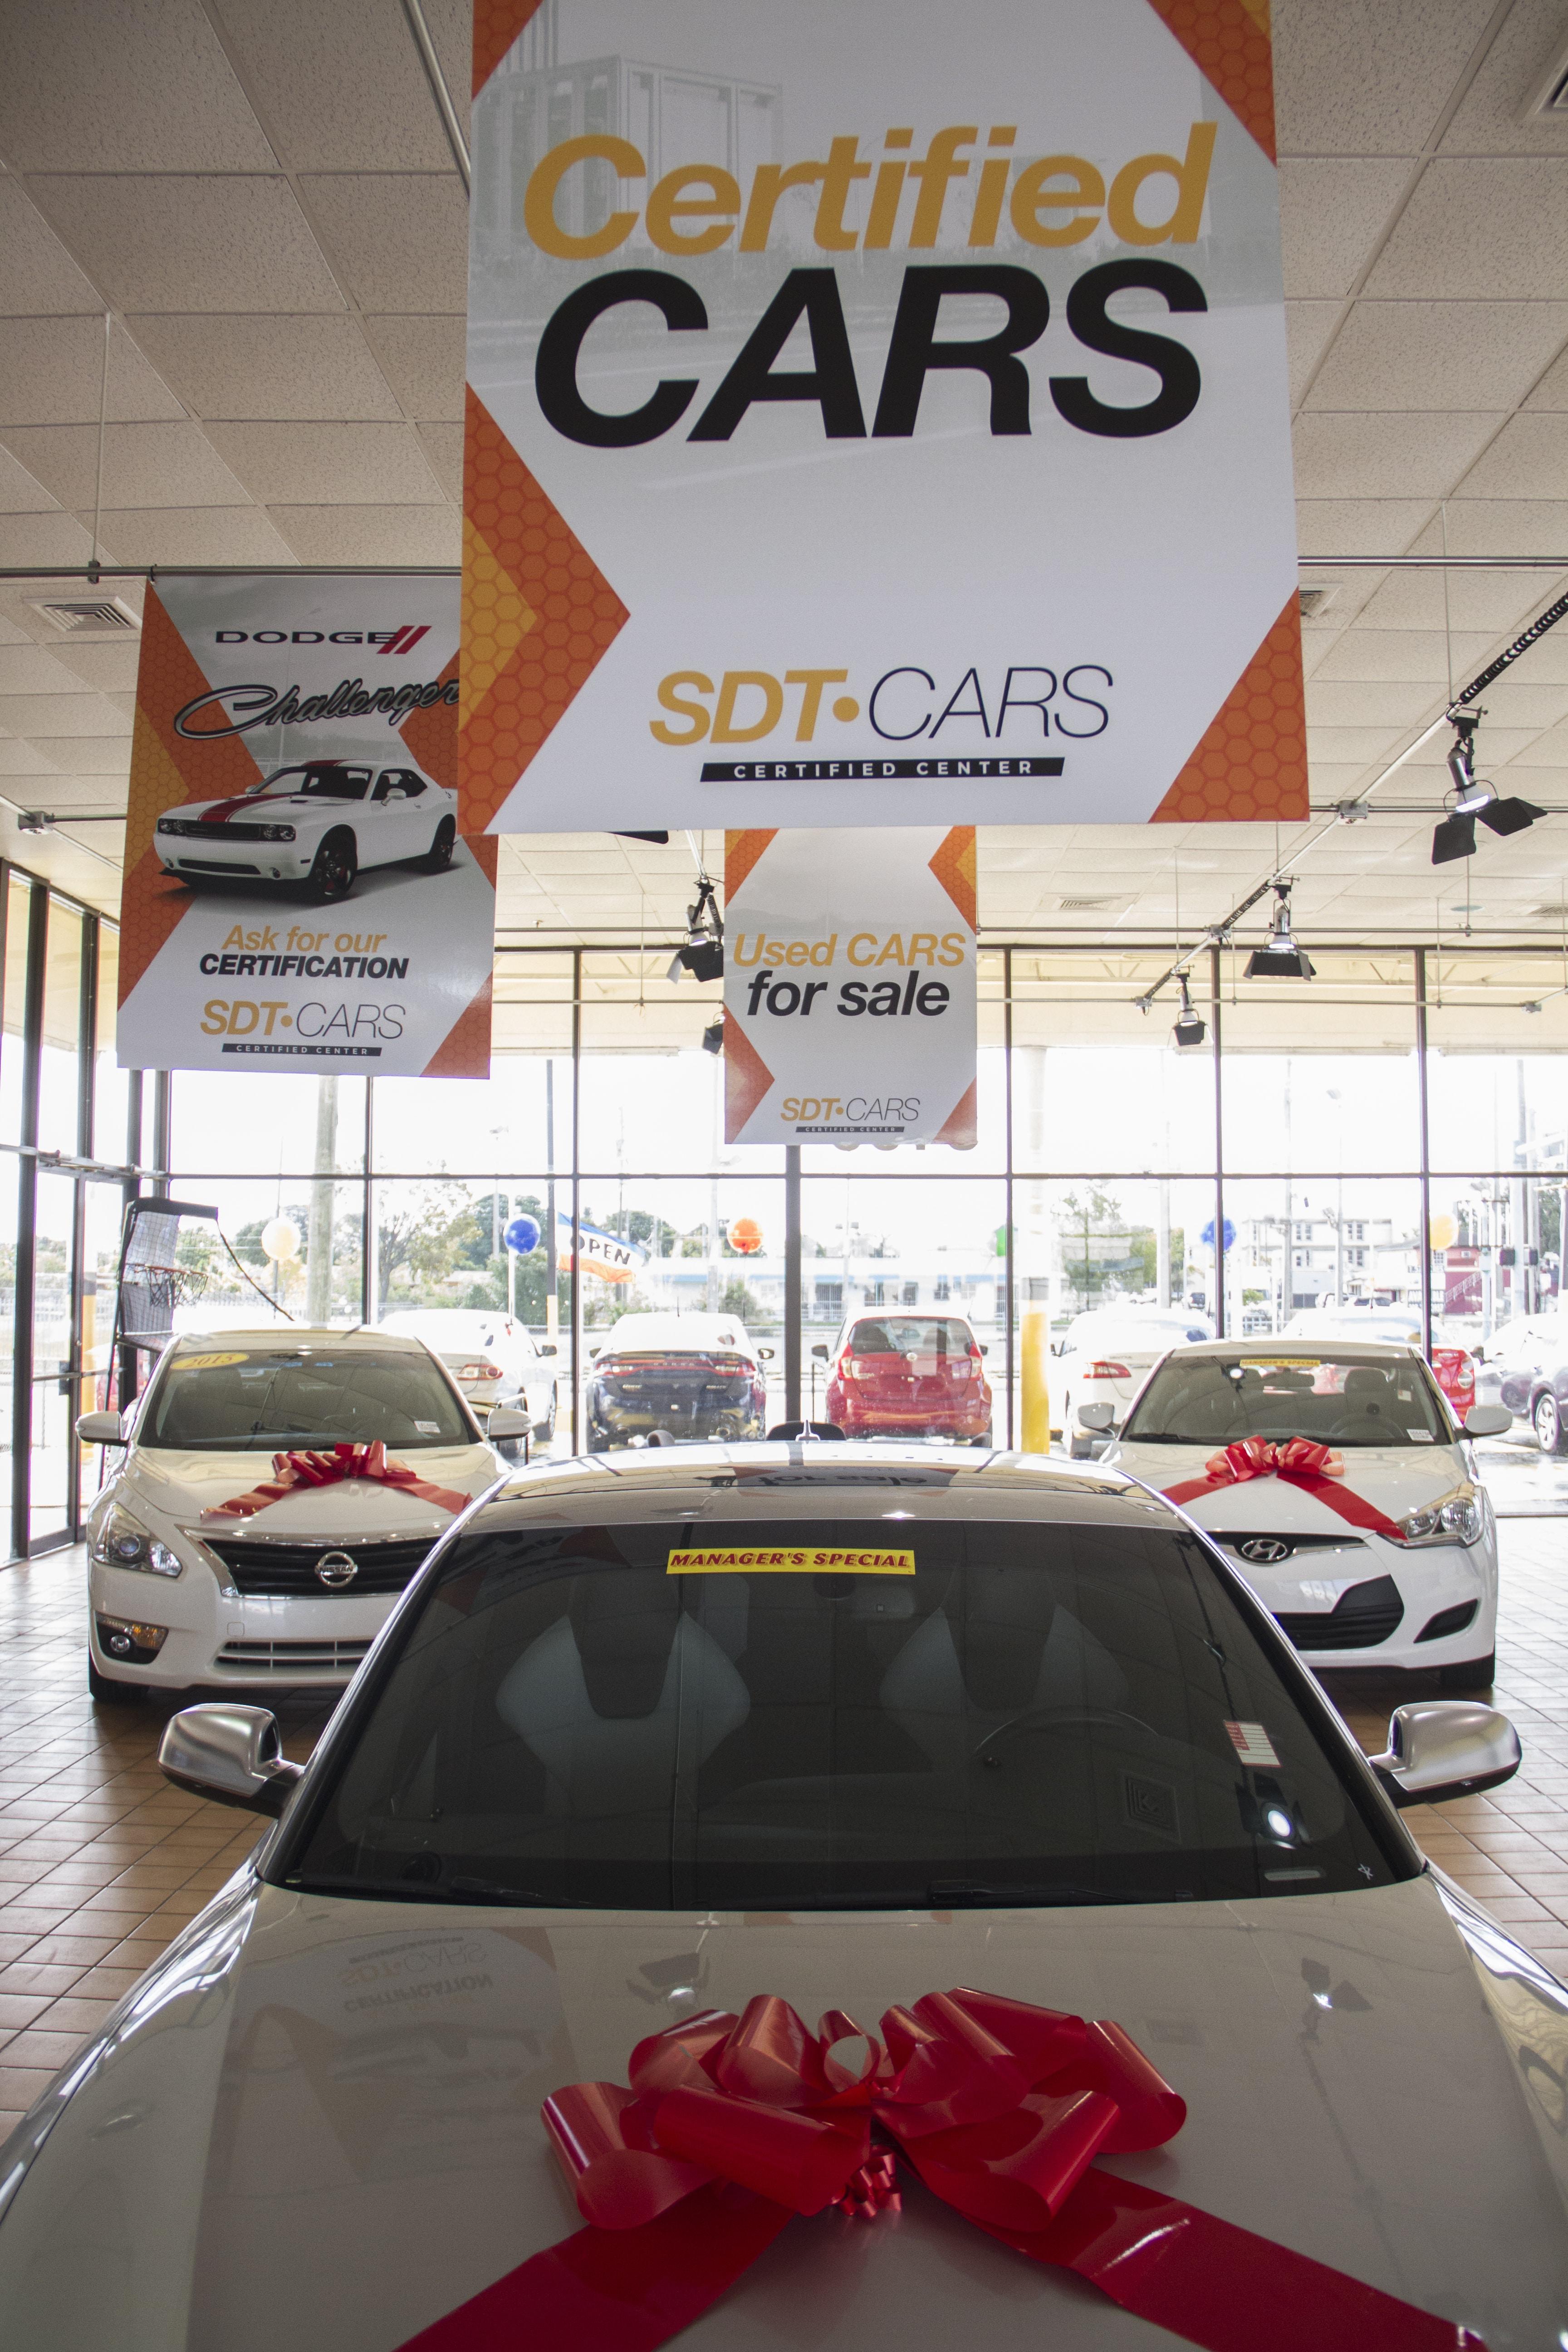 SDT Cars image 6